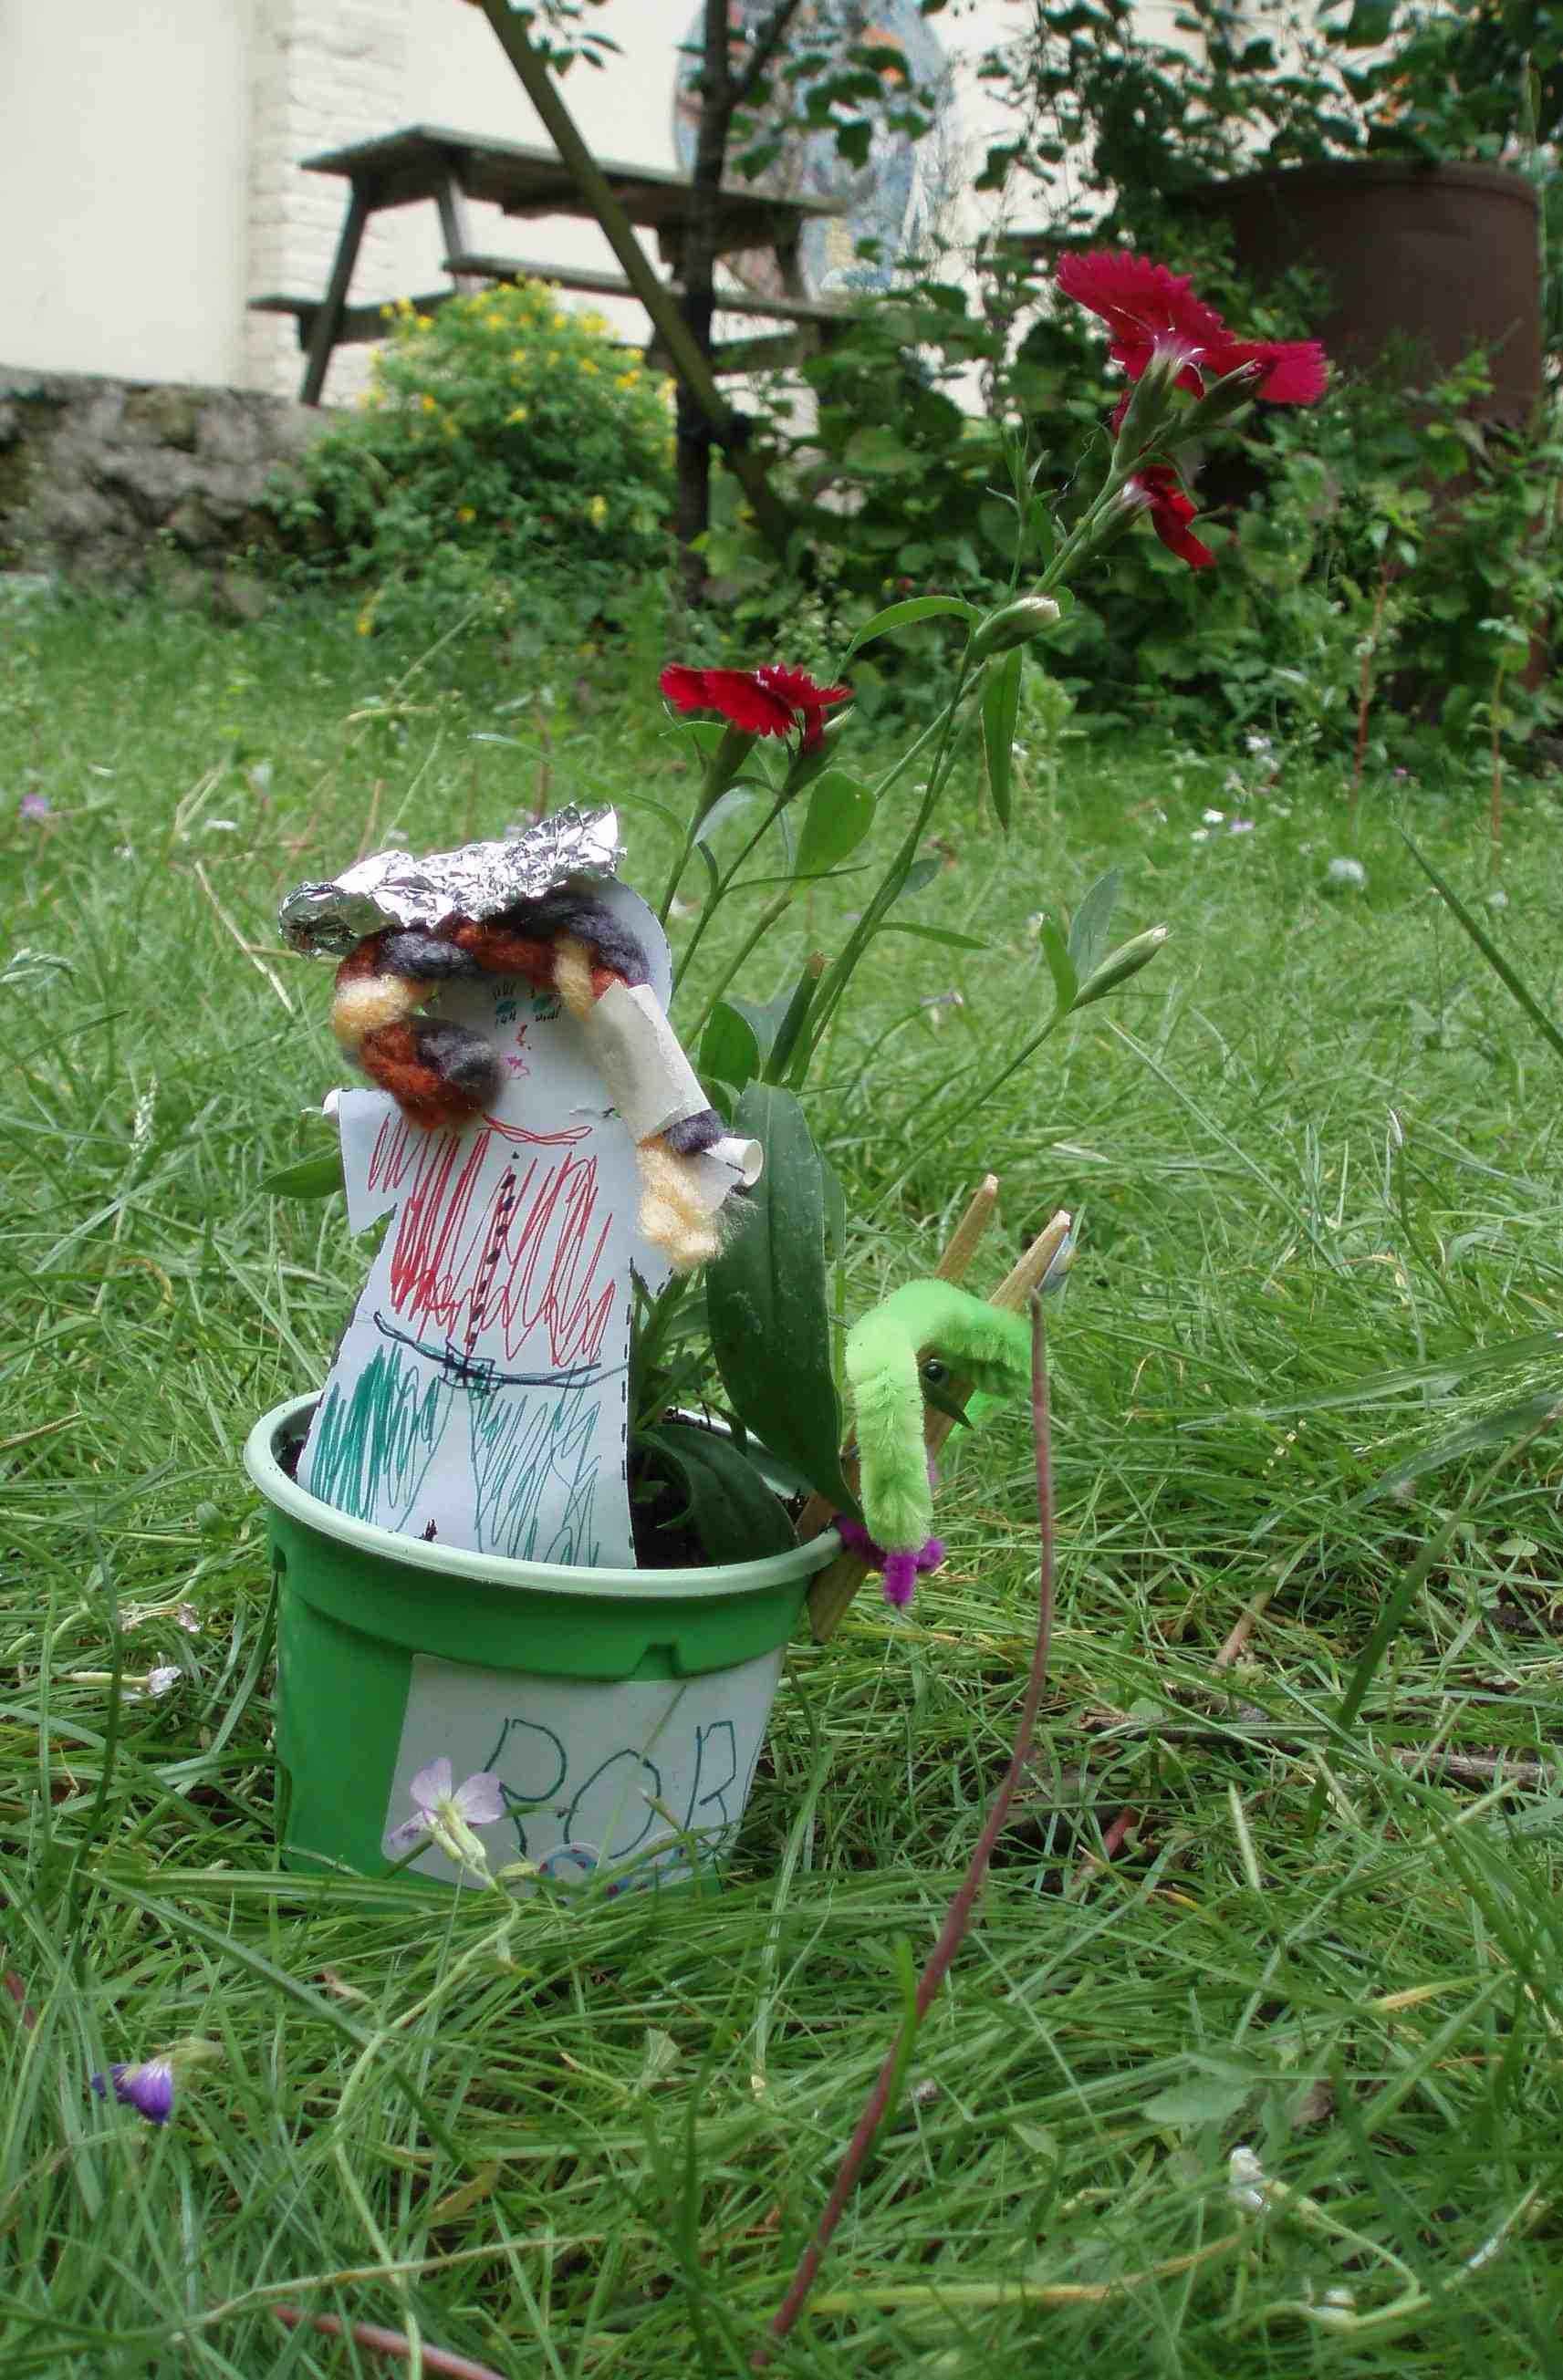 Scarecrow to take home, Open Garden Squares Weekend Preview at Cafe Crema, 2014